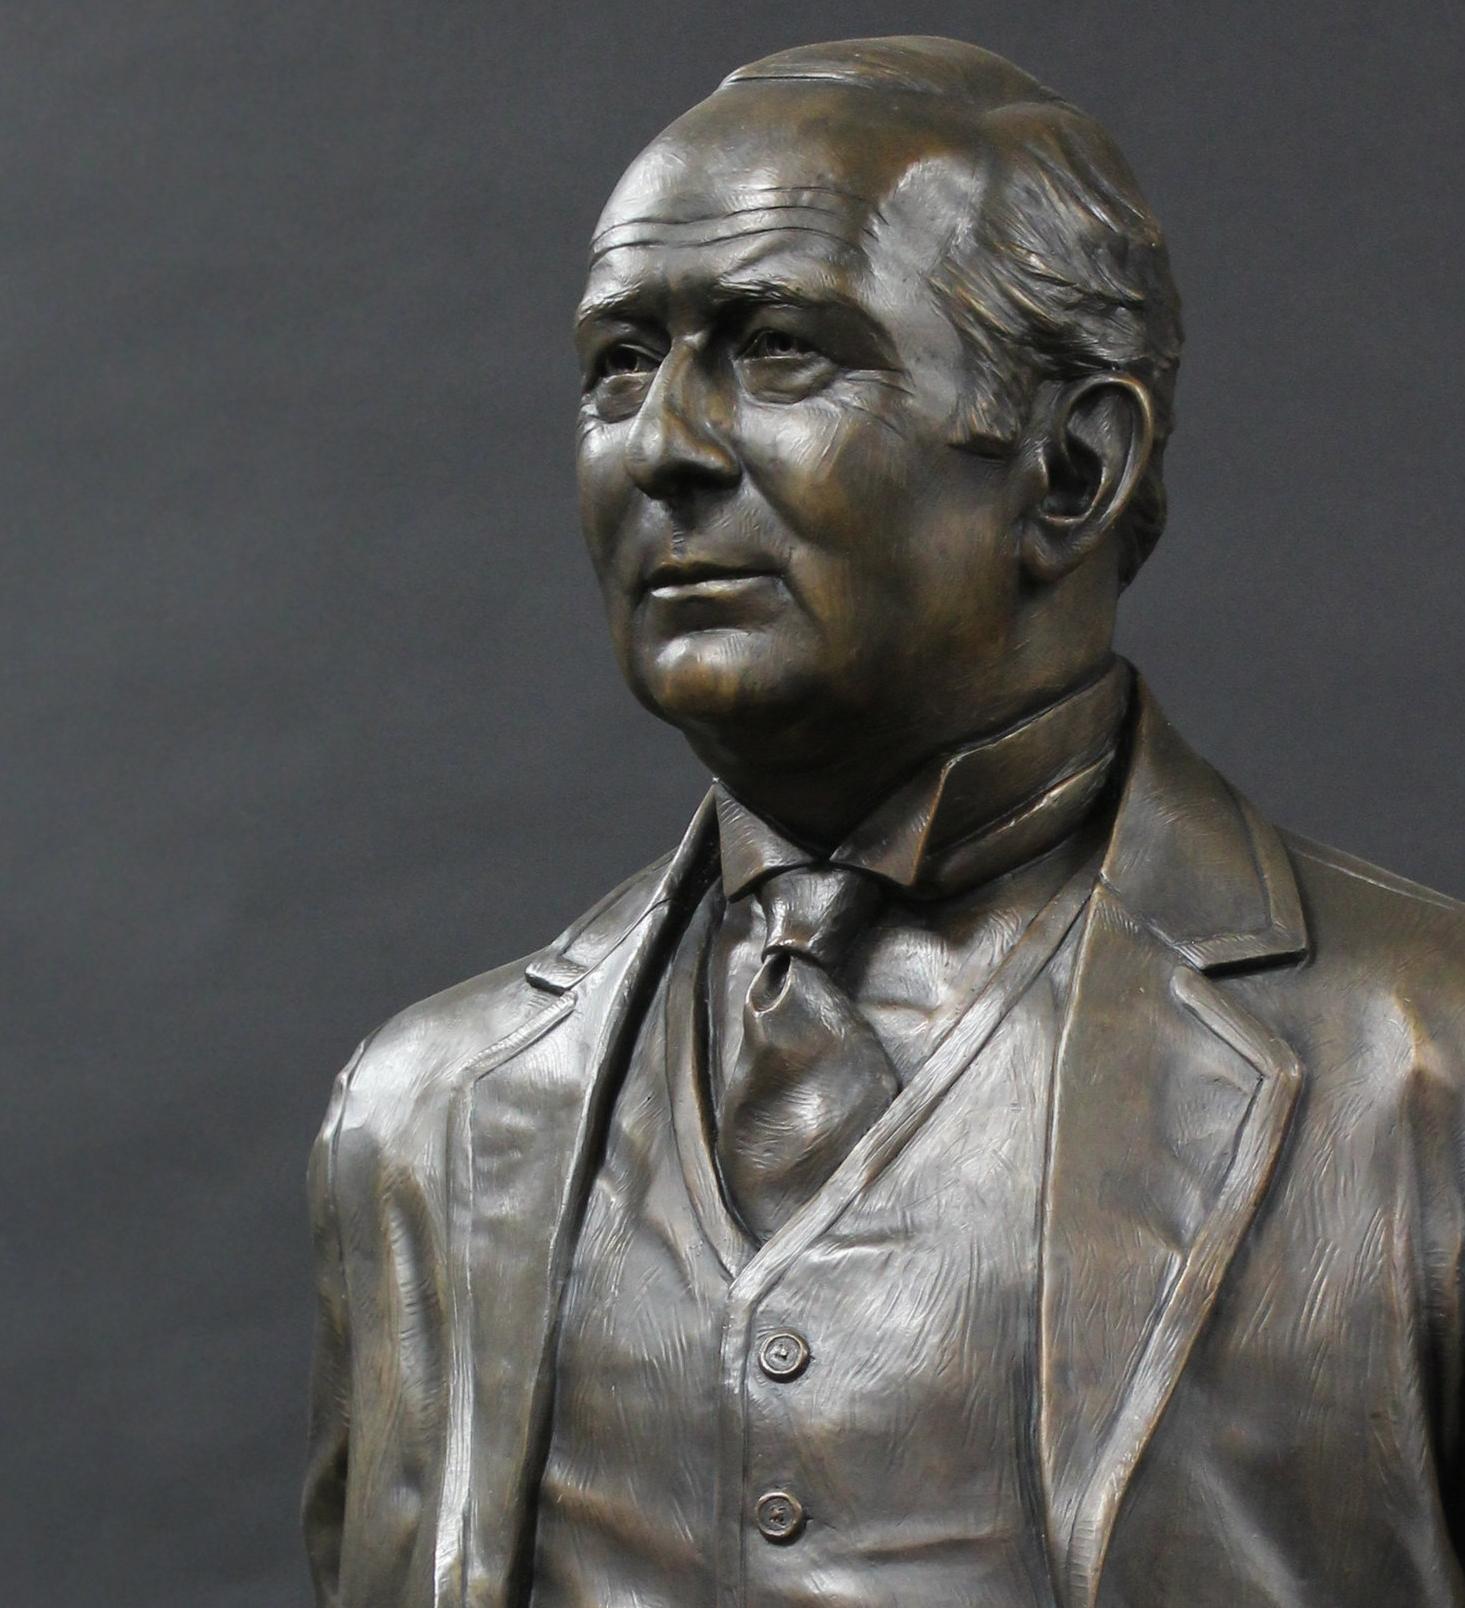 James B. Duke - Charlotte, NC